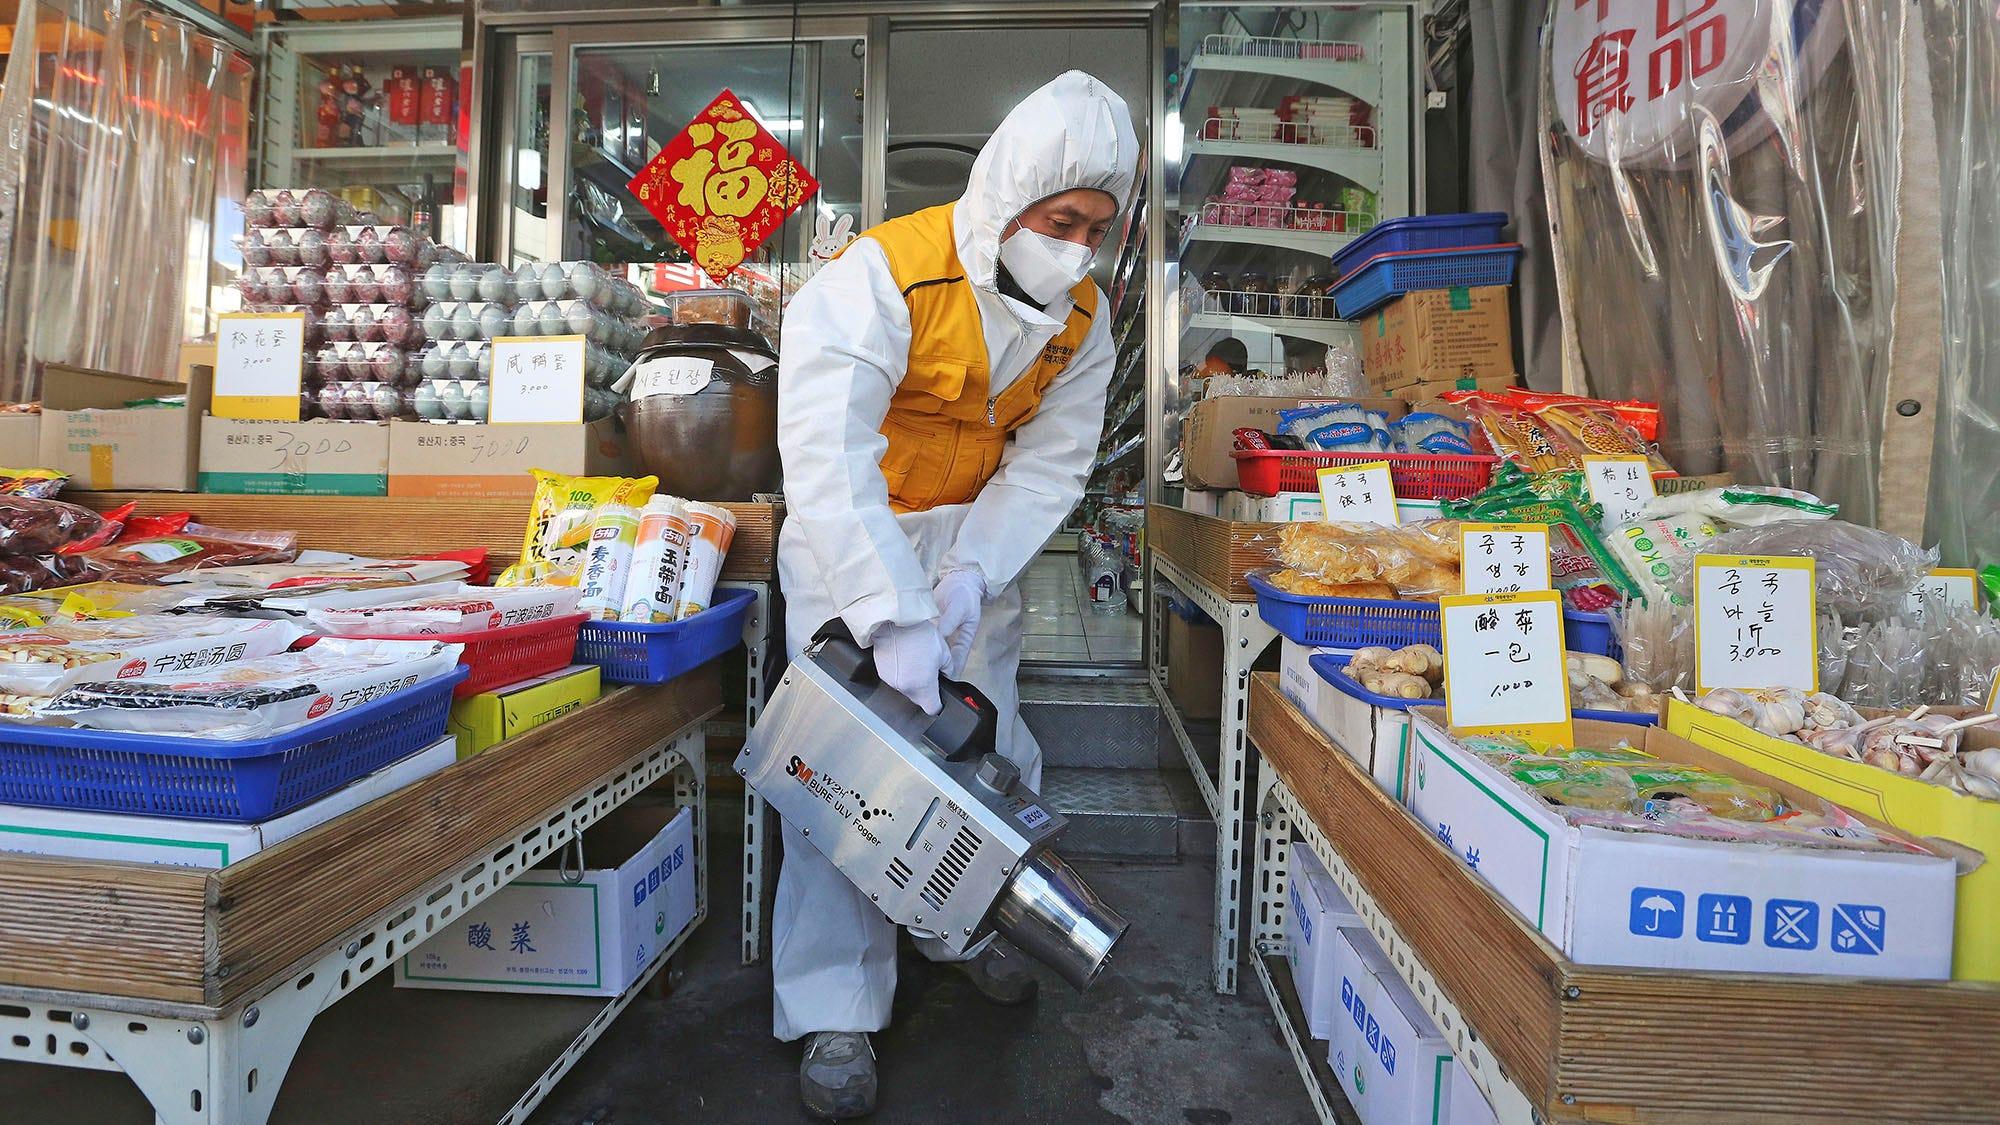 Coronavirus may ravage technology supply chains